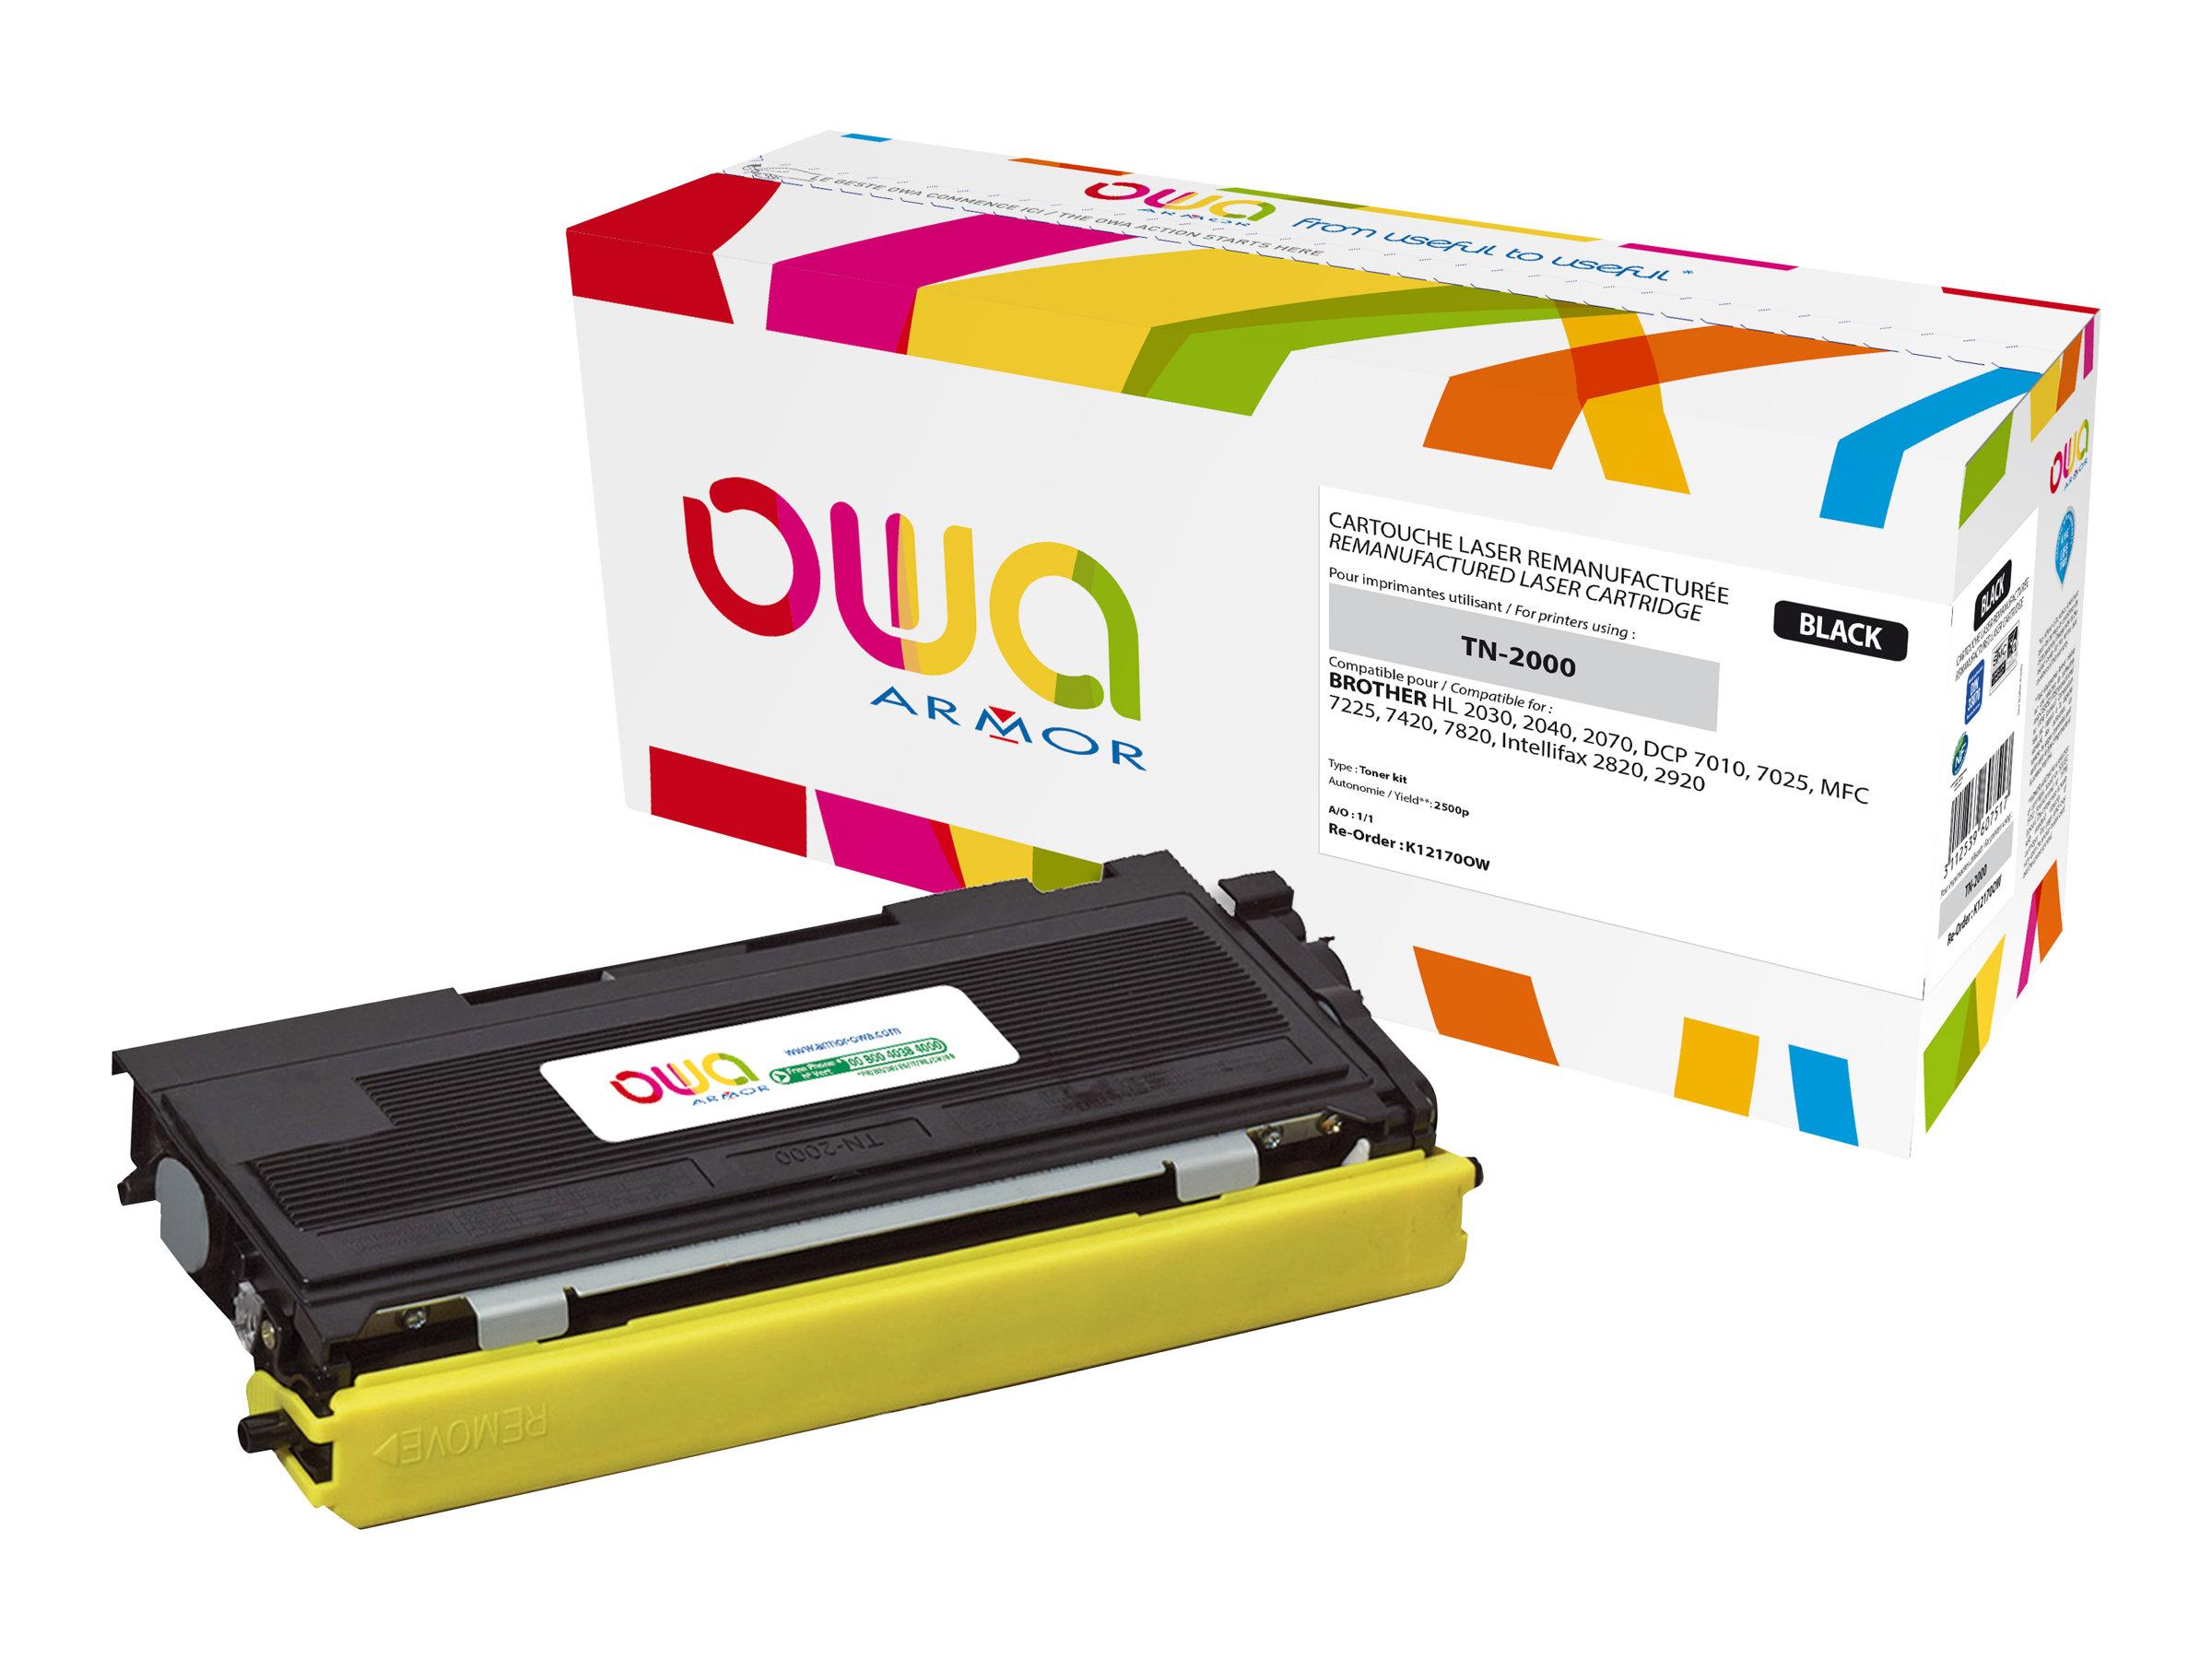 HP 641A - remanufacturé OWA K12004OW - magenta - cartouche laser